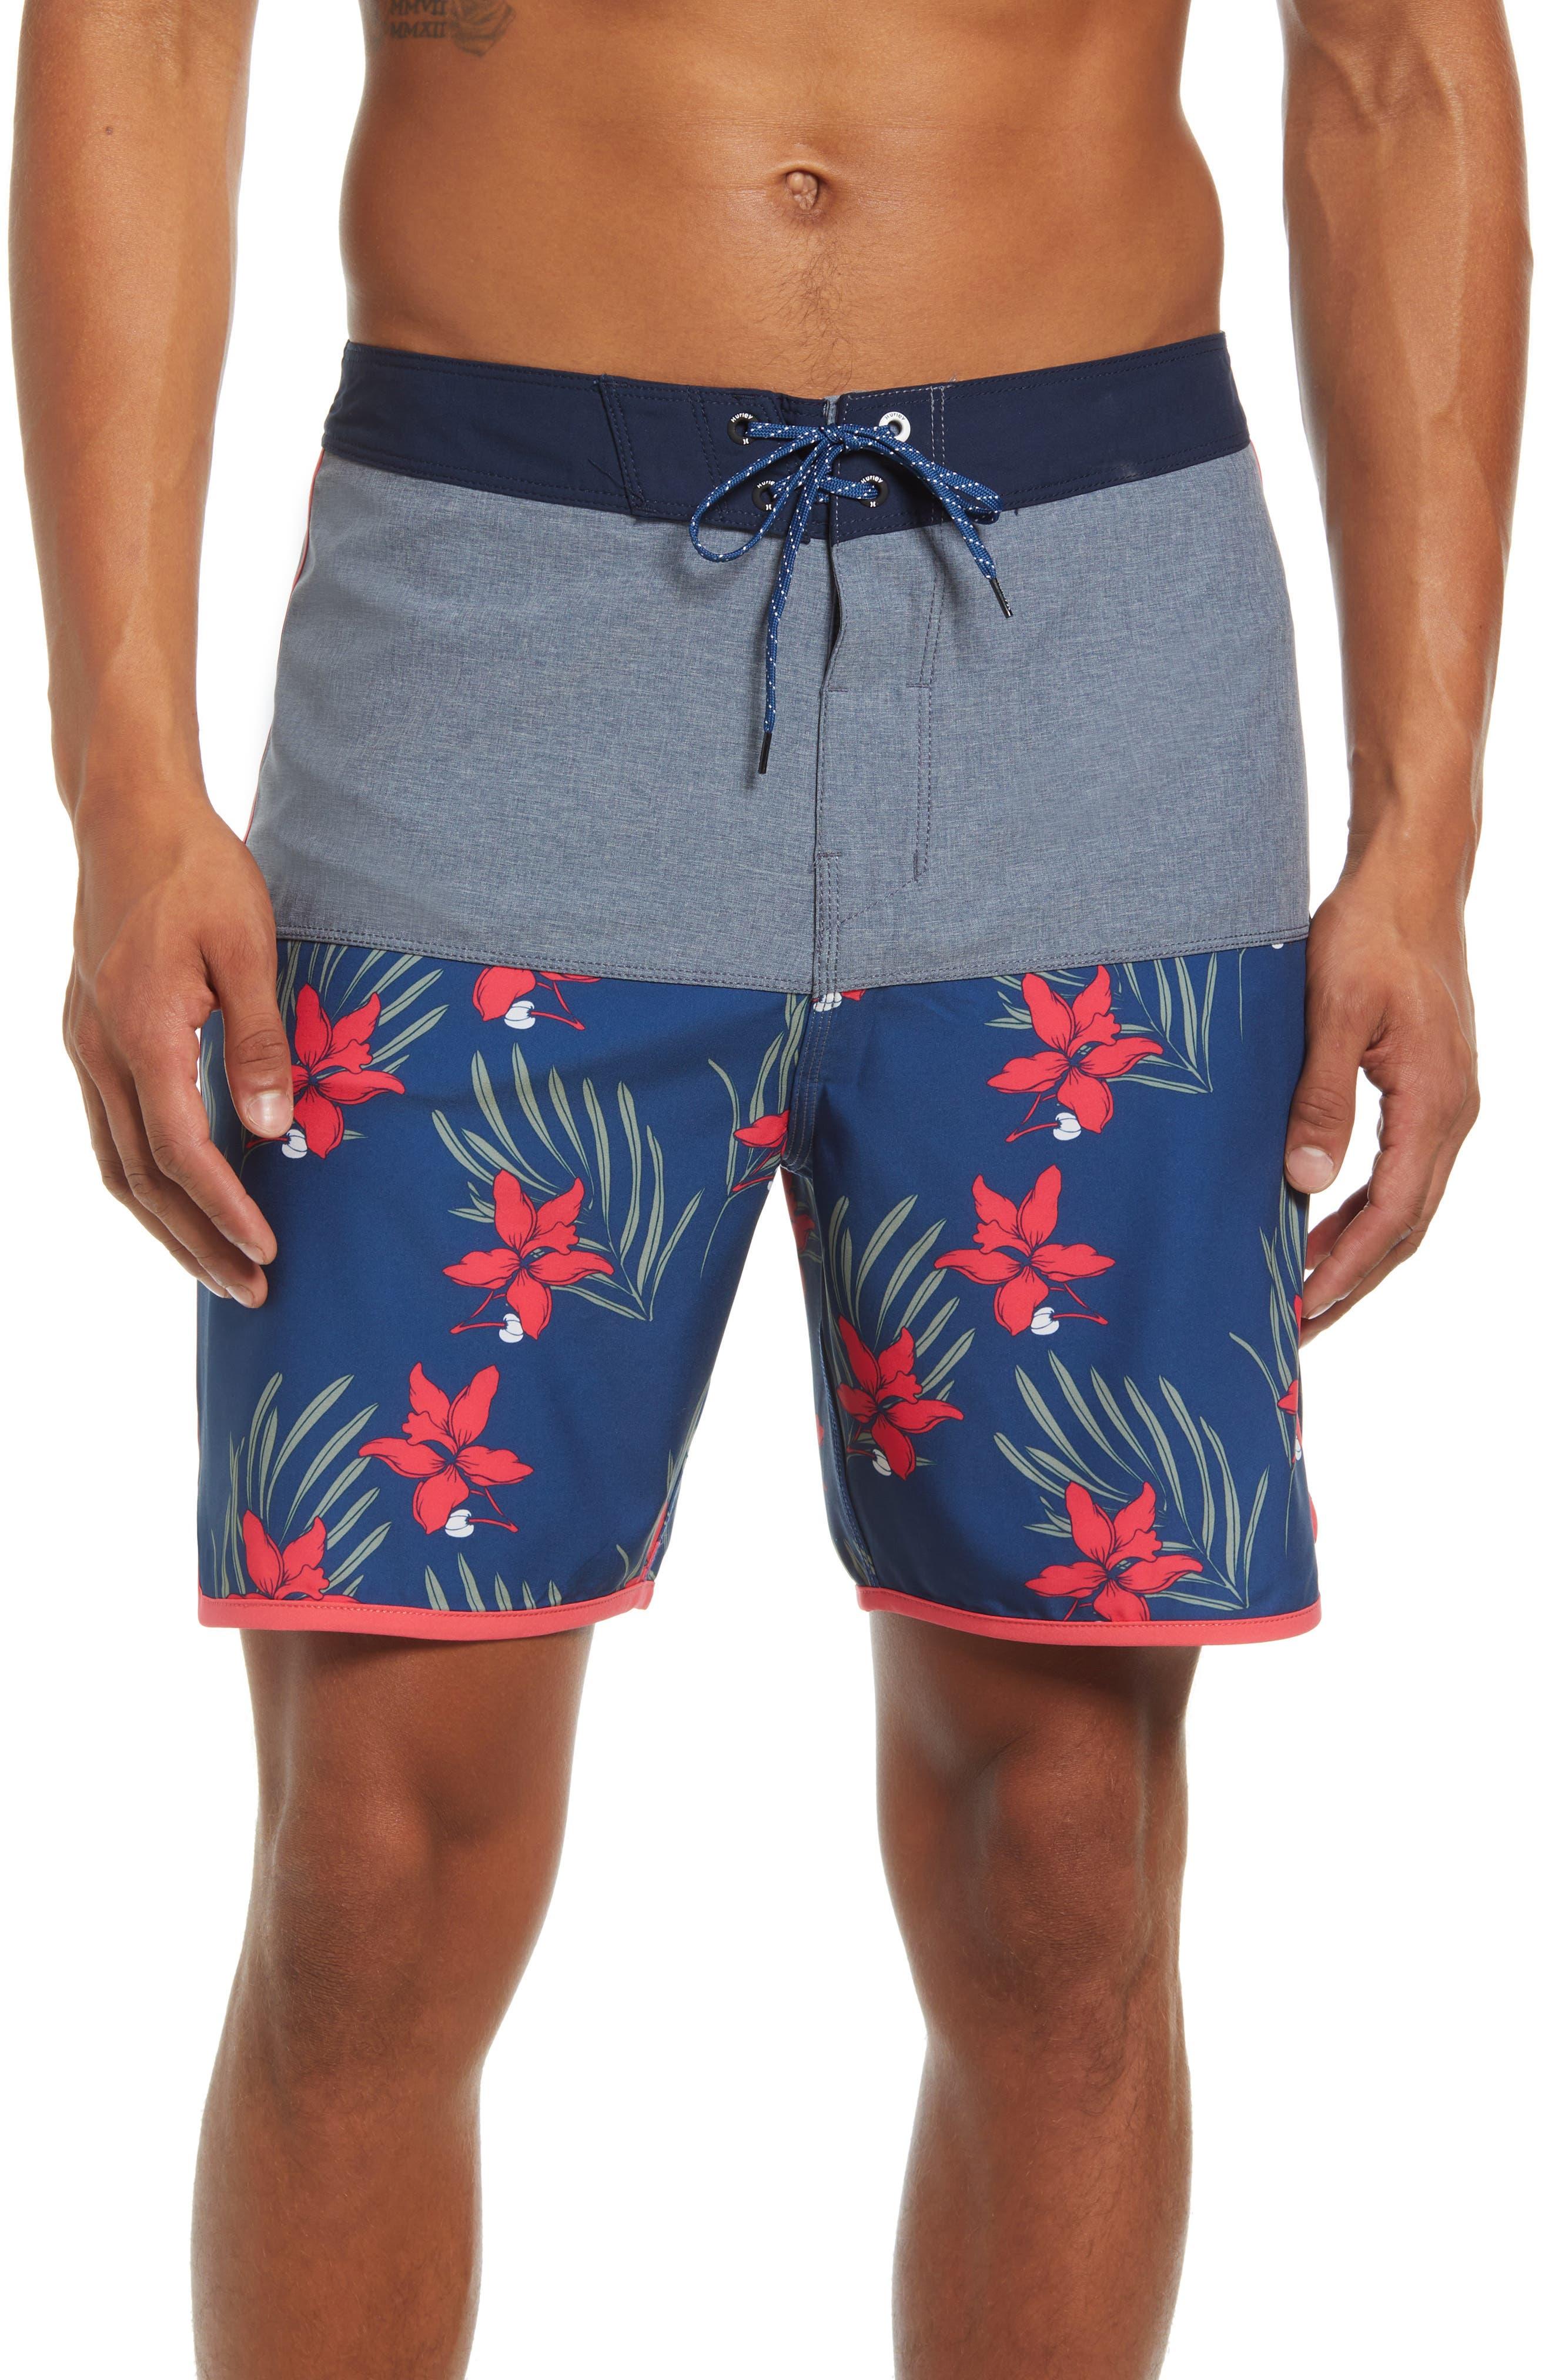 Phantom Malibu Floral Board Shorts